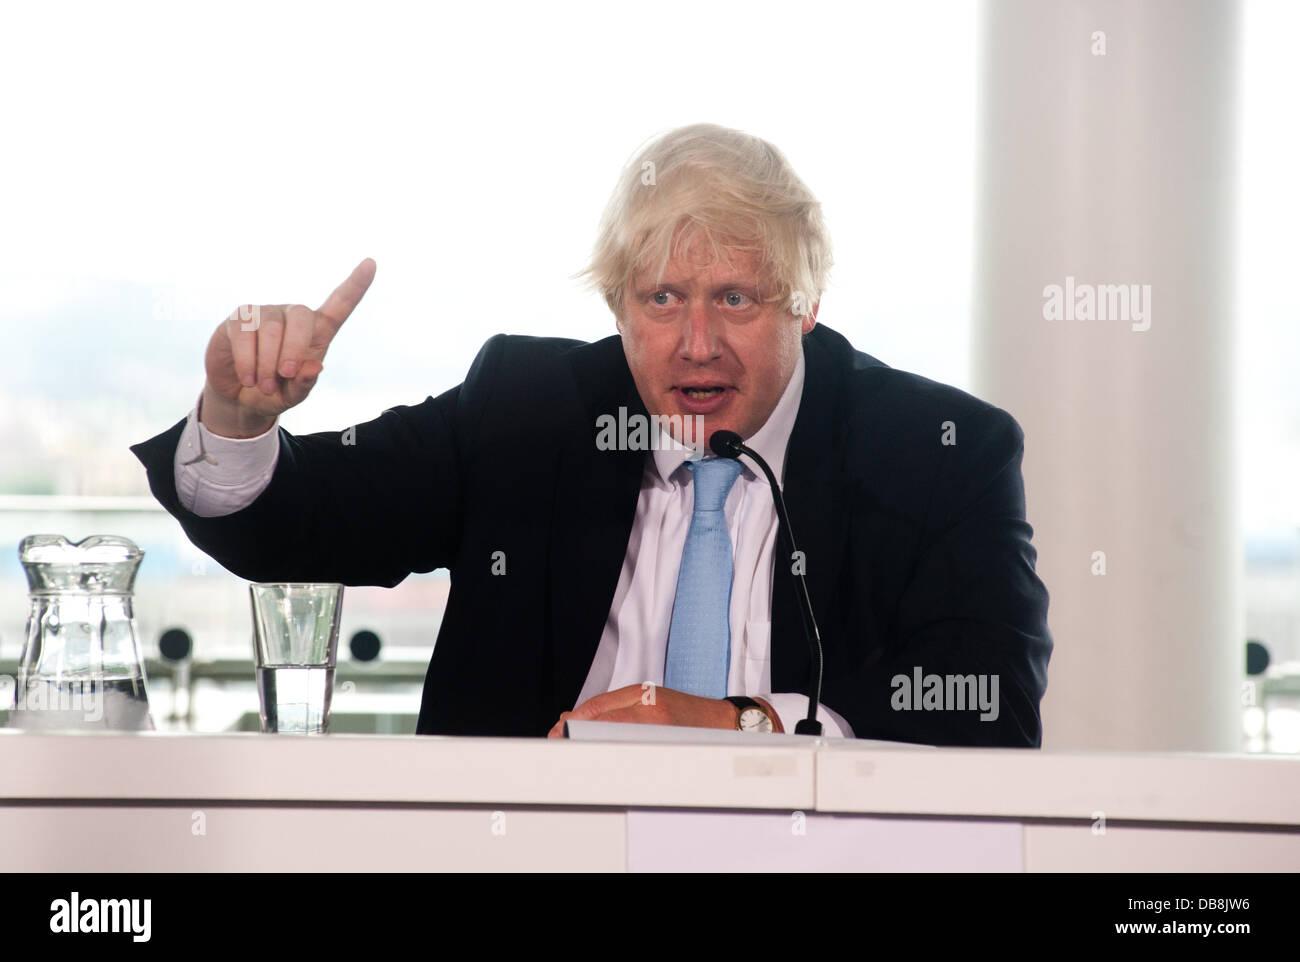 London, UK - 25 July 2013: Mayor of London, Boris Johnson speaks during the press conference to examine the legacy Stock Photo